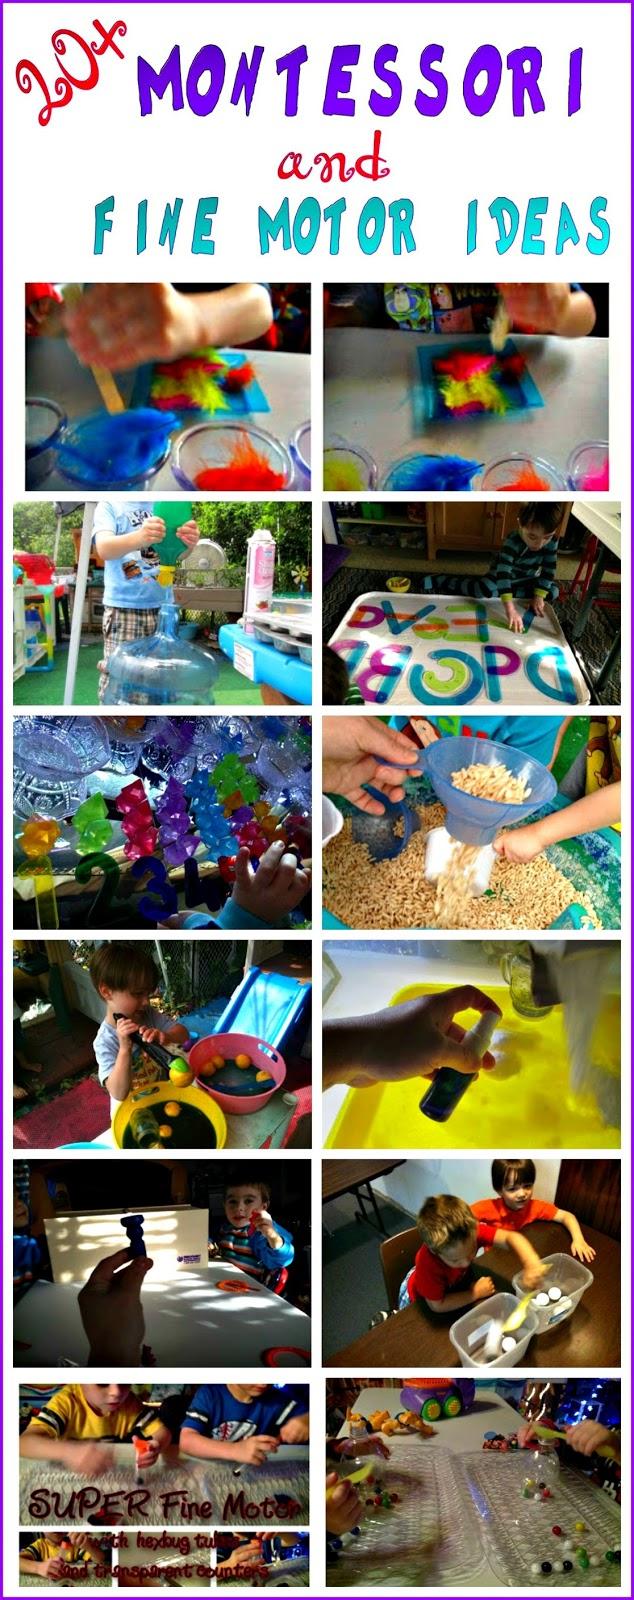 20 montessori and fine motor ideas epic childhood for Montessori fine motor skills